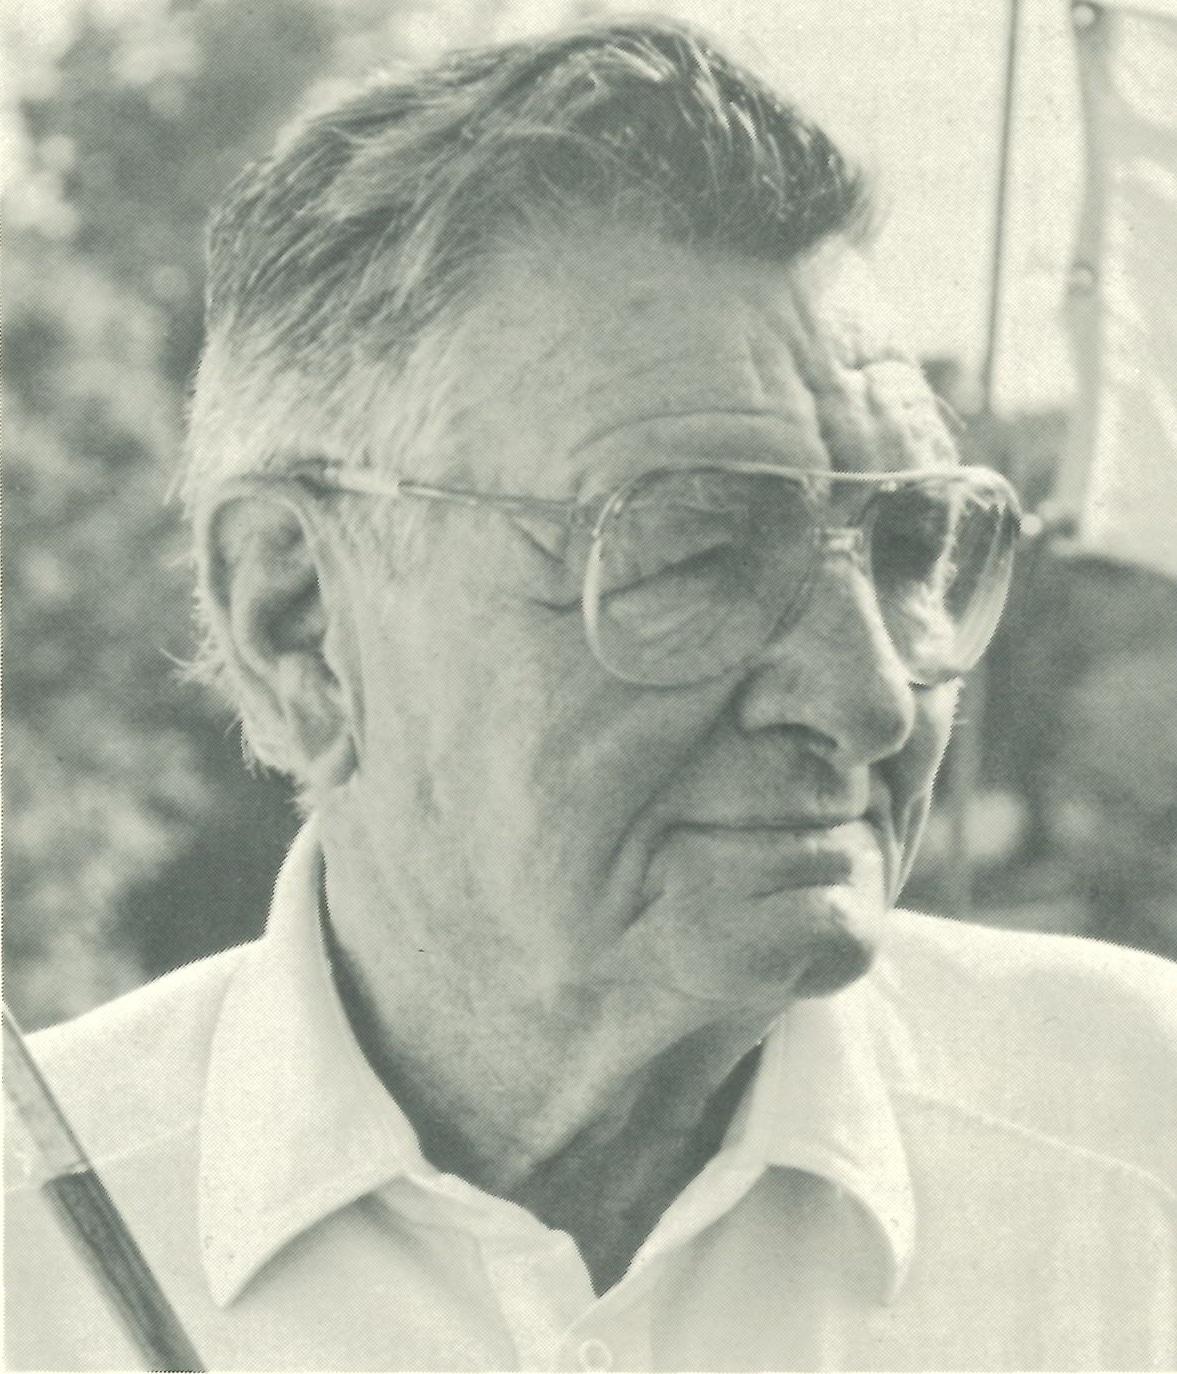 Harold McSpaden